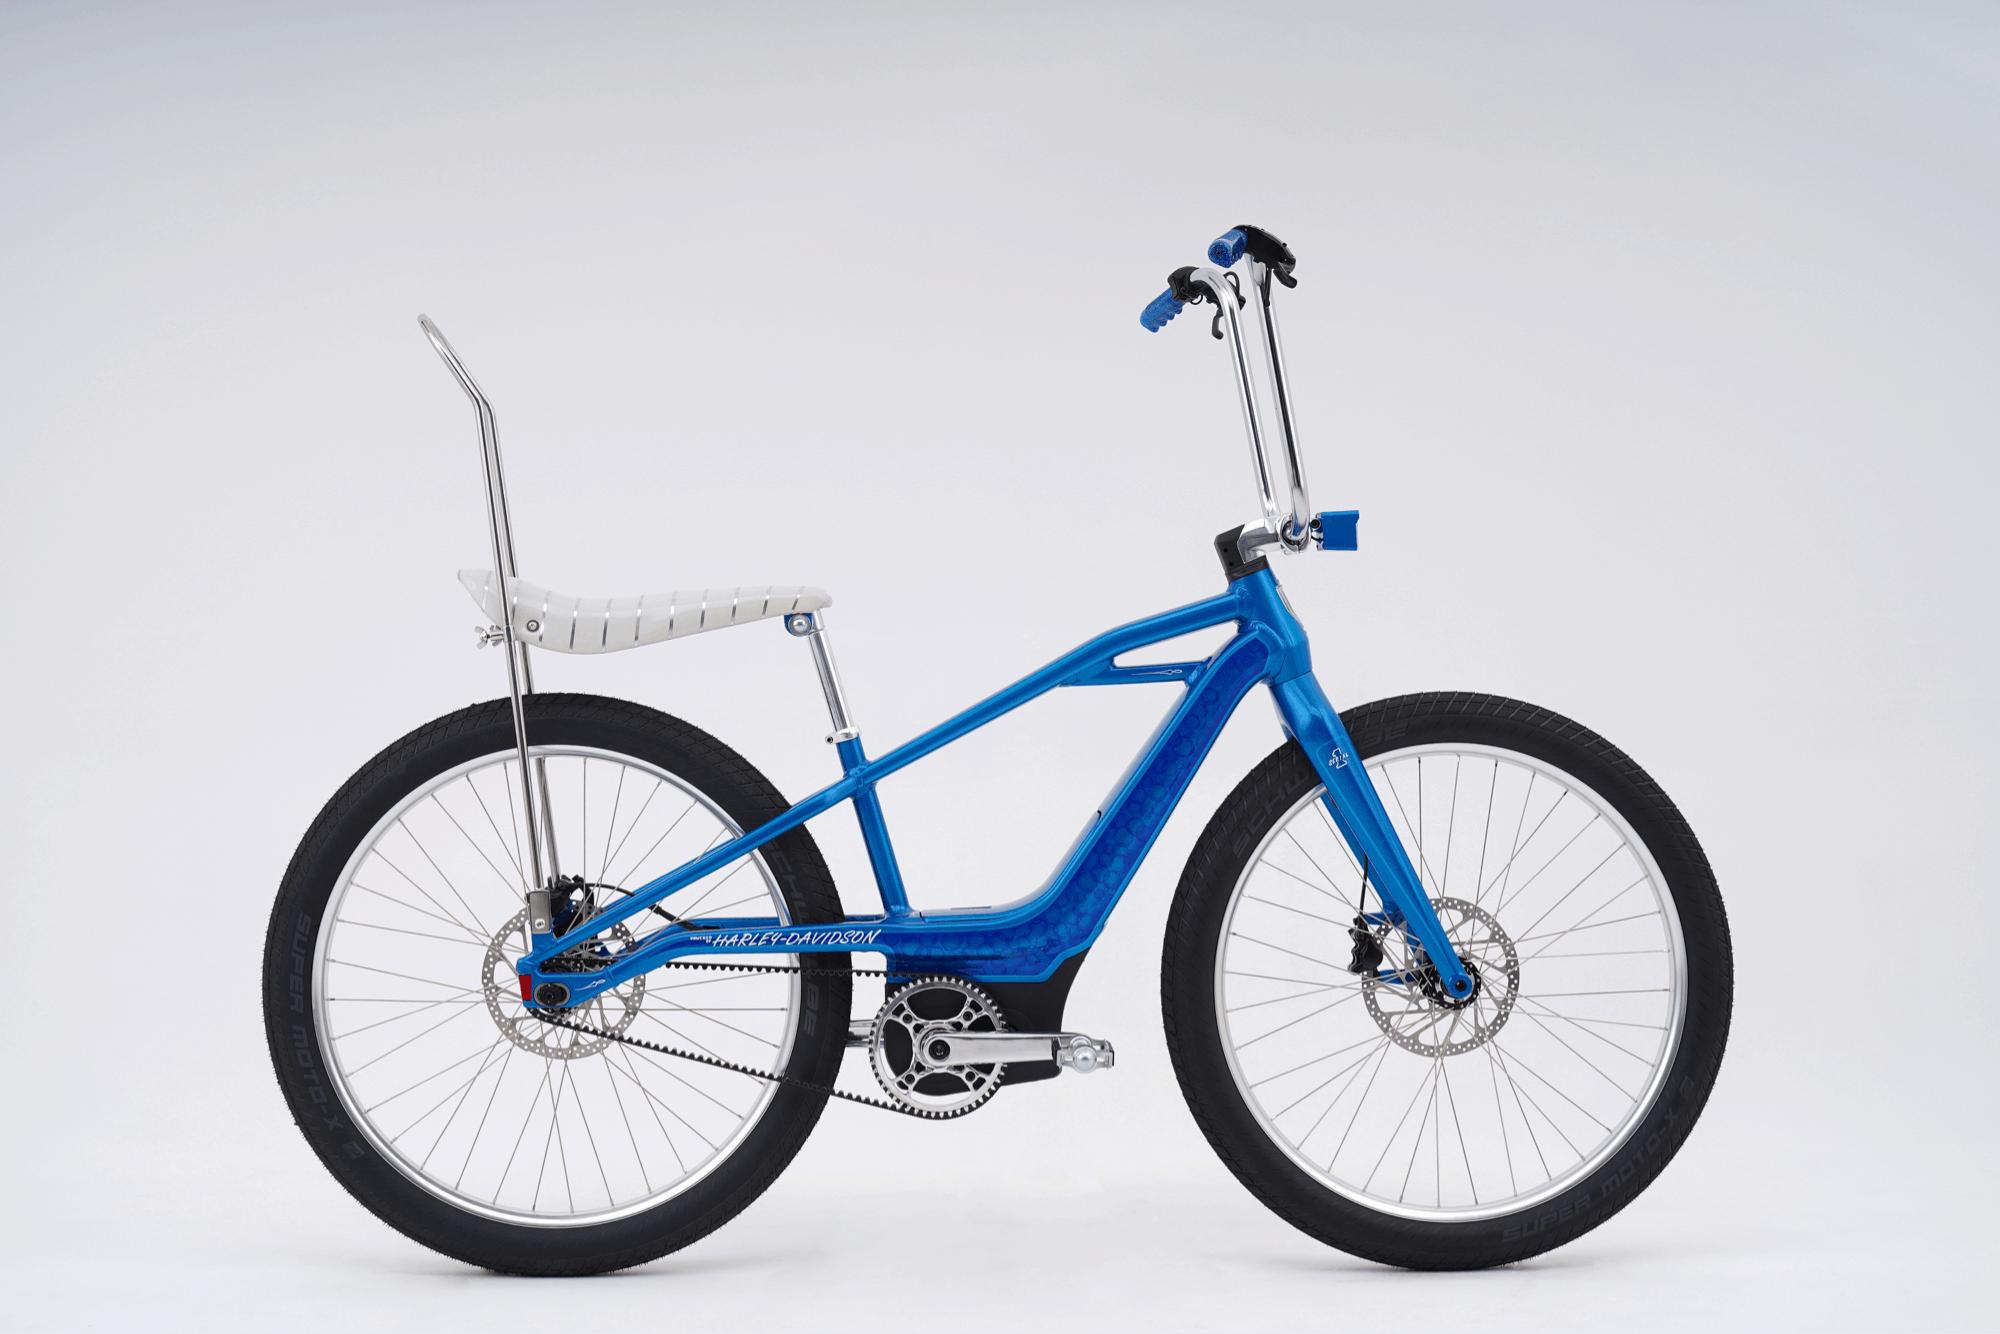 модель Mosh/Chopper від Harley Davidson